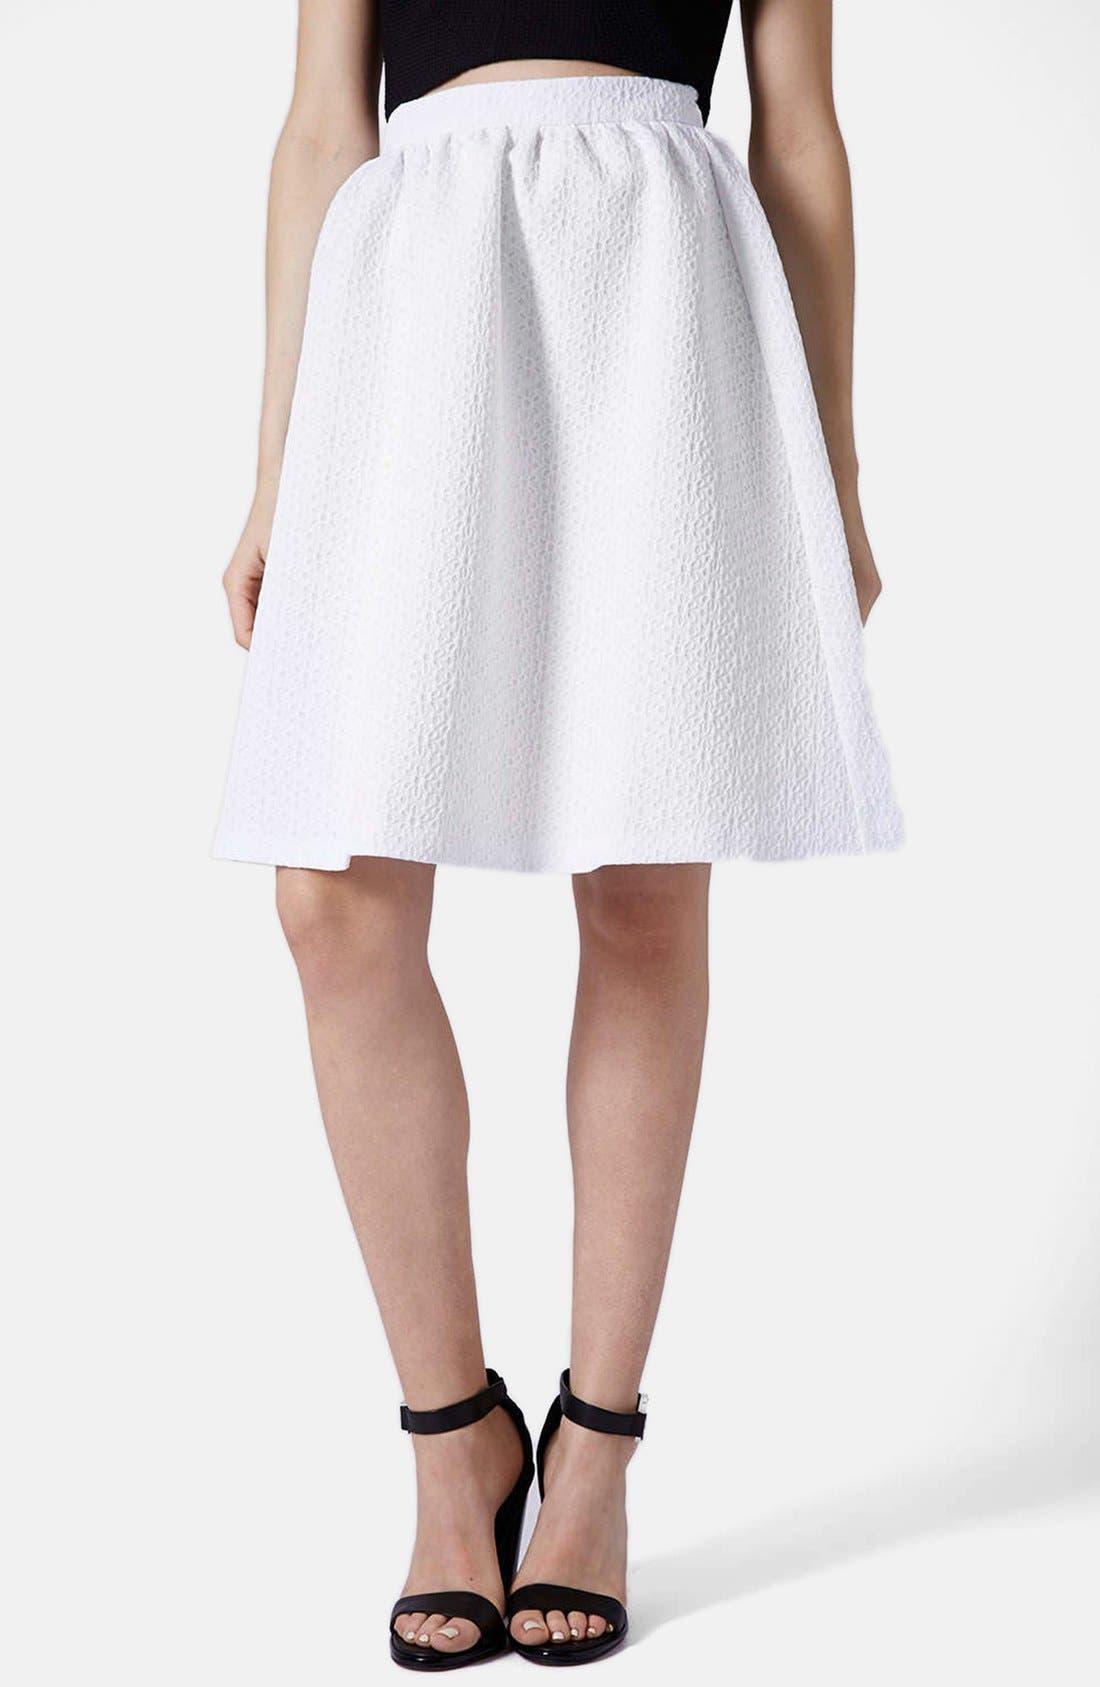 Alternate Image 1 Selected - Topshop Daisy Jacquard Flare Skirt